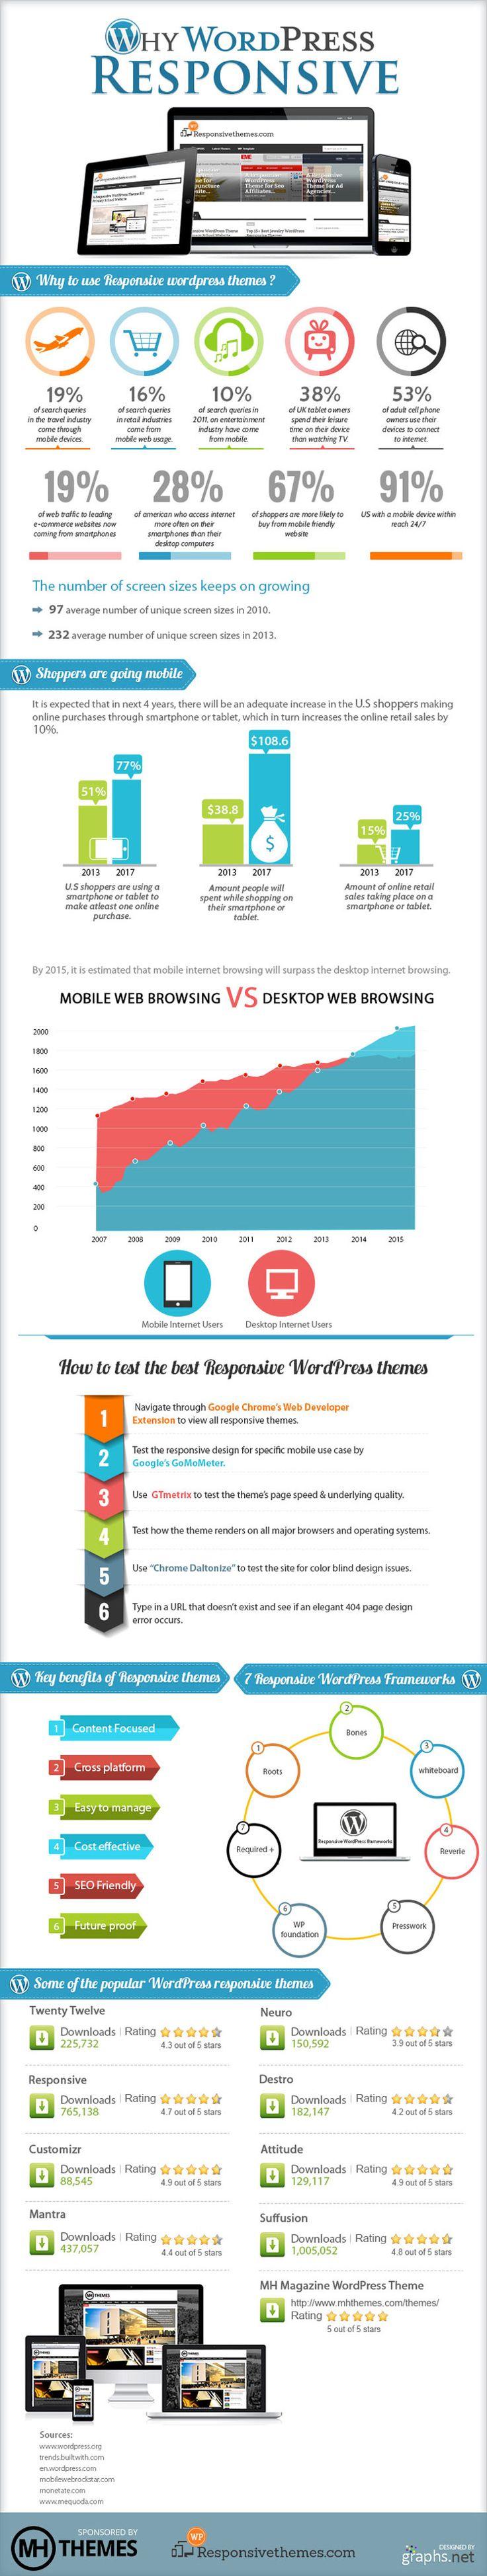 Why use WordPress responsive Themes